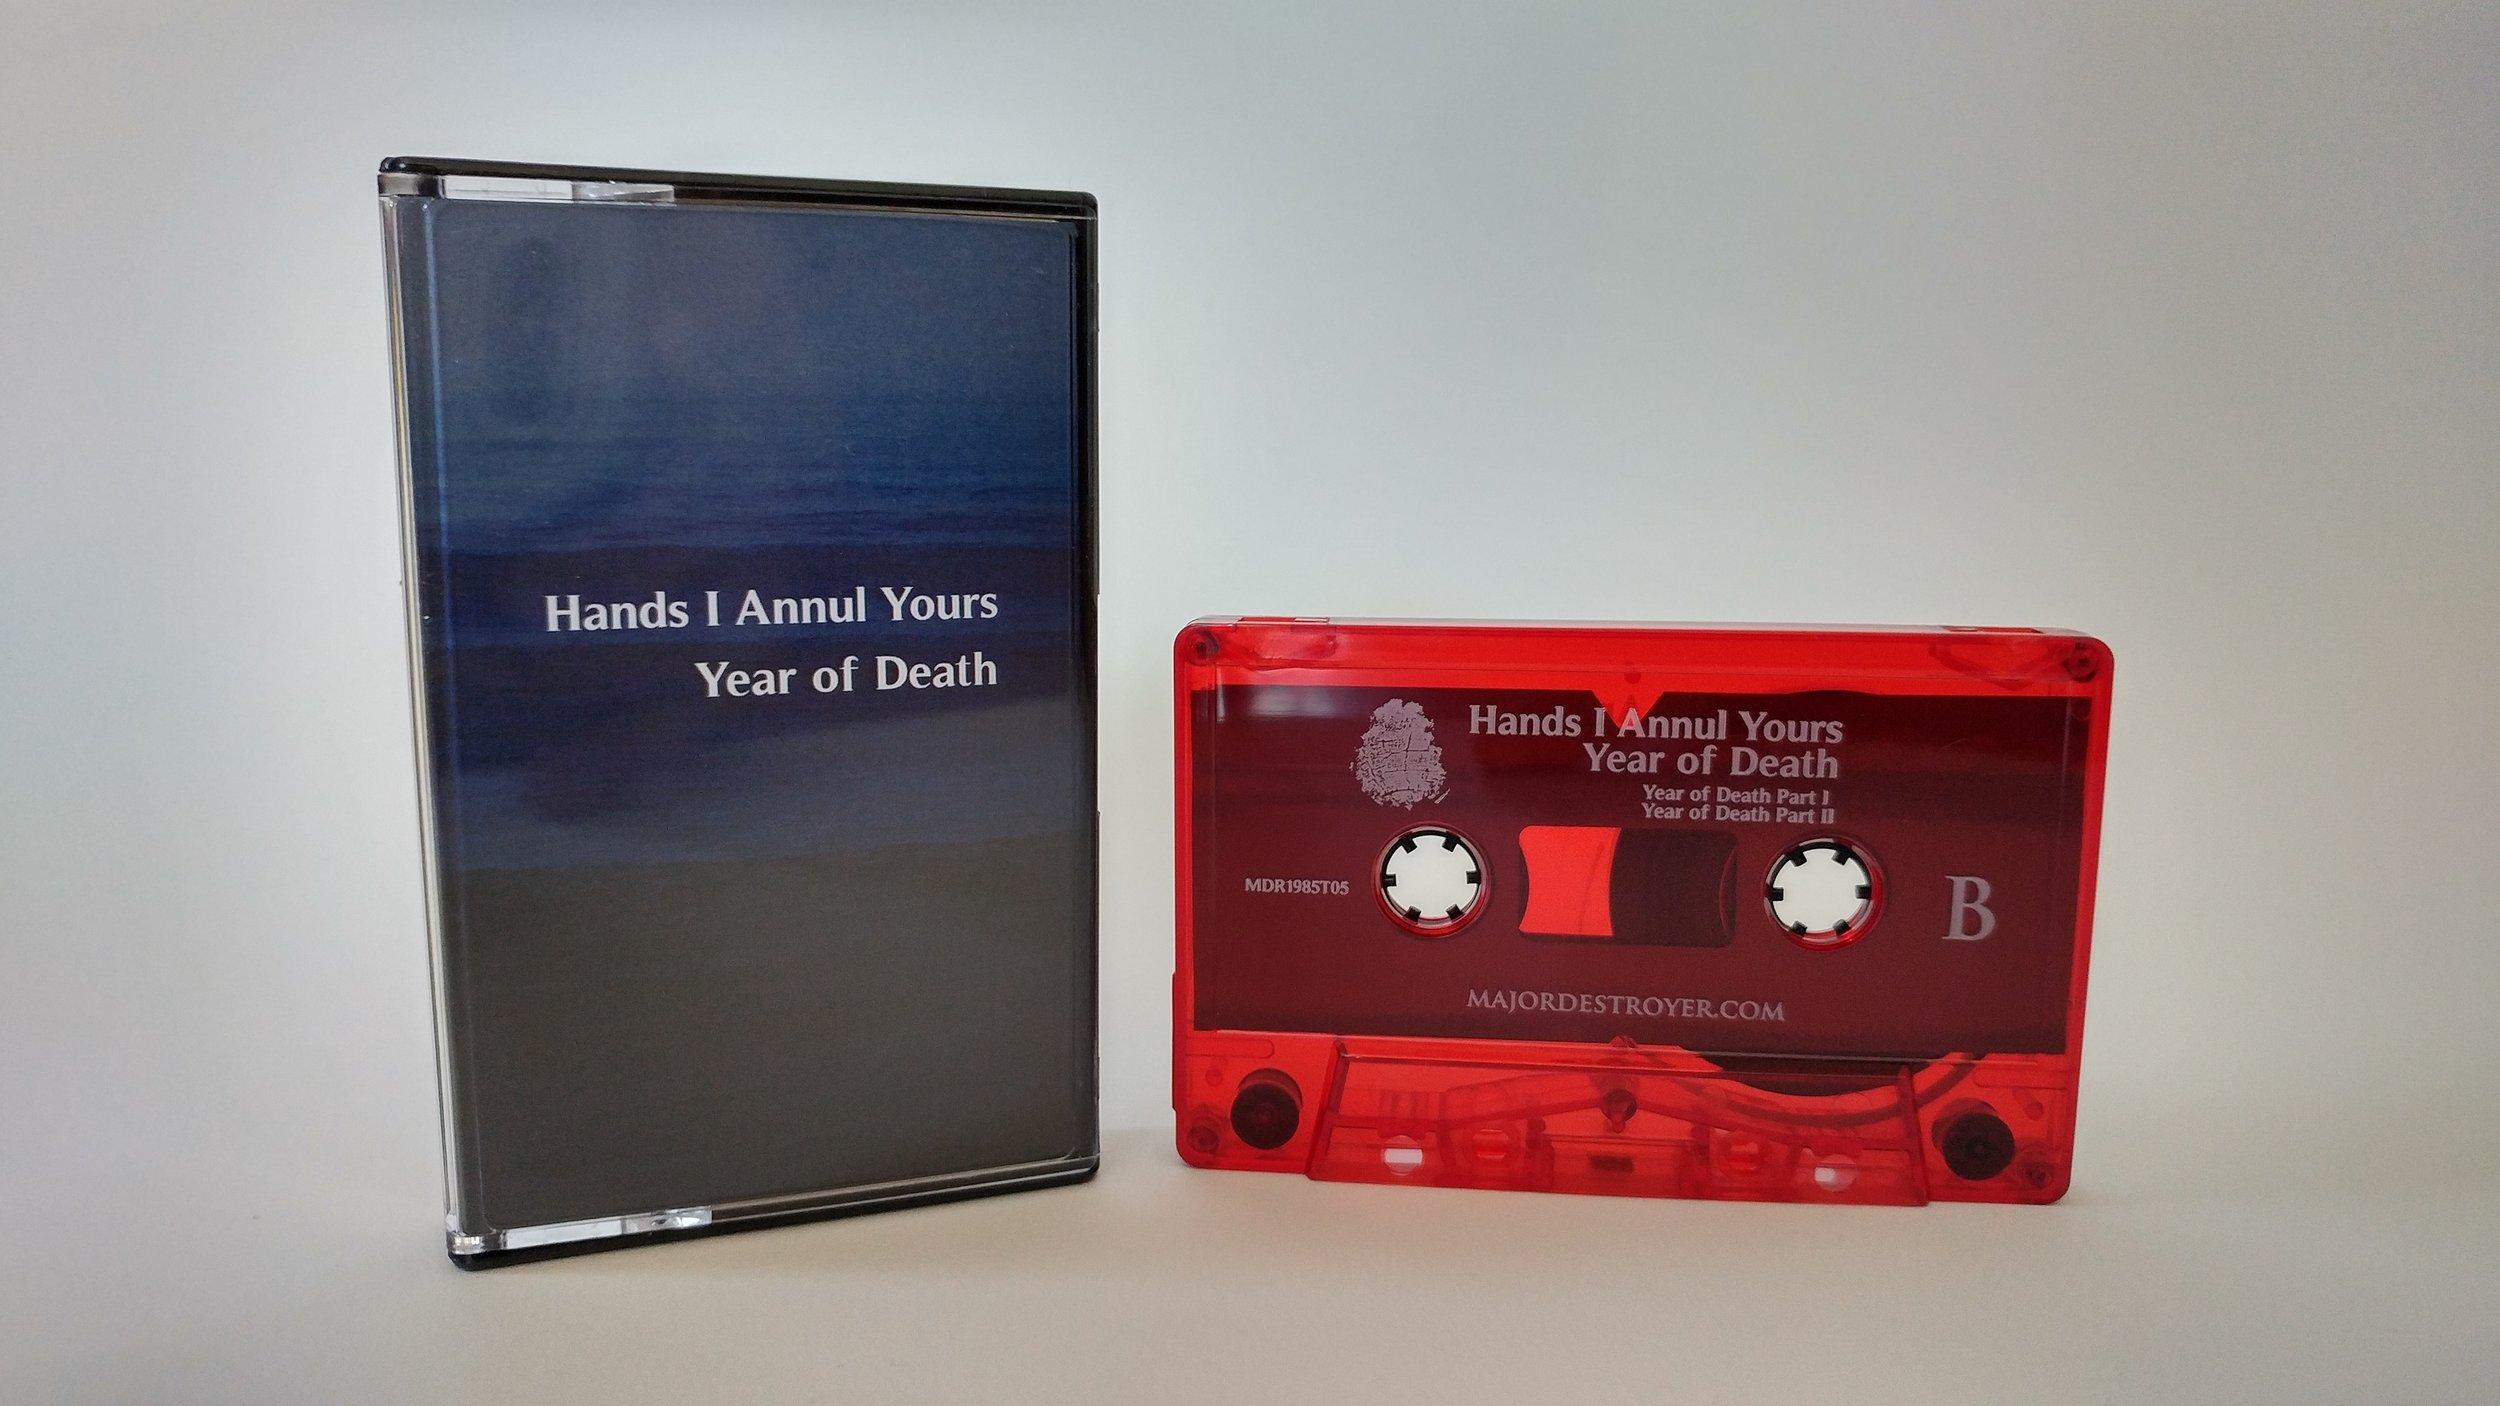 Year-of-Death-cropped.jpg